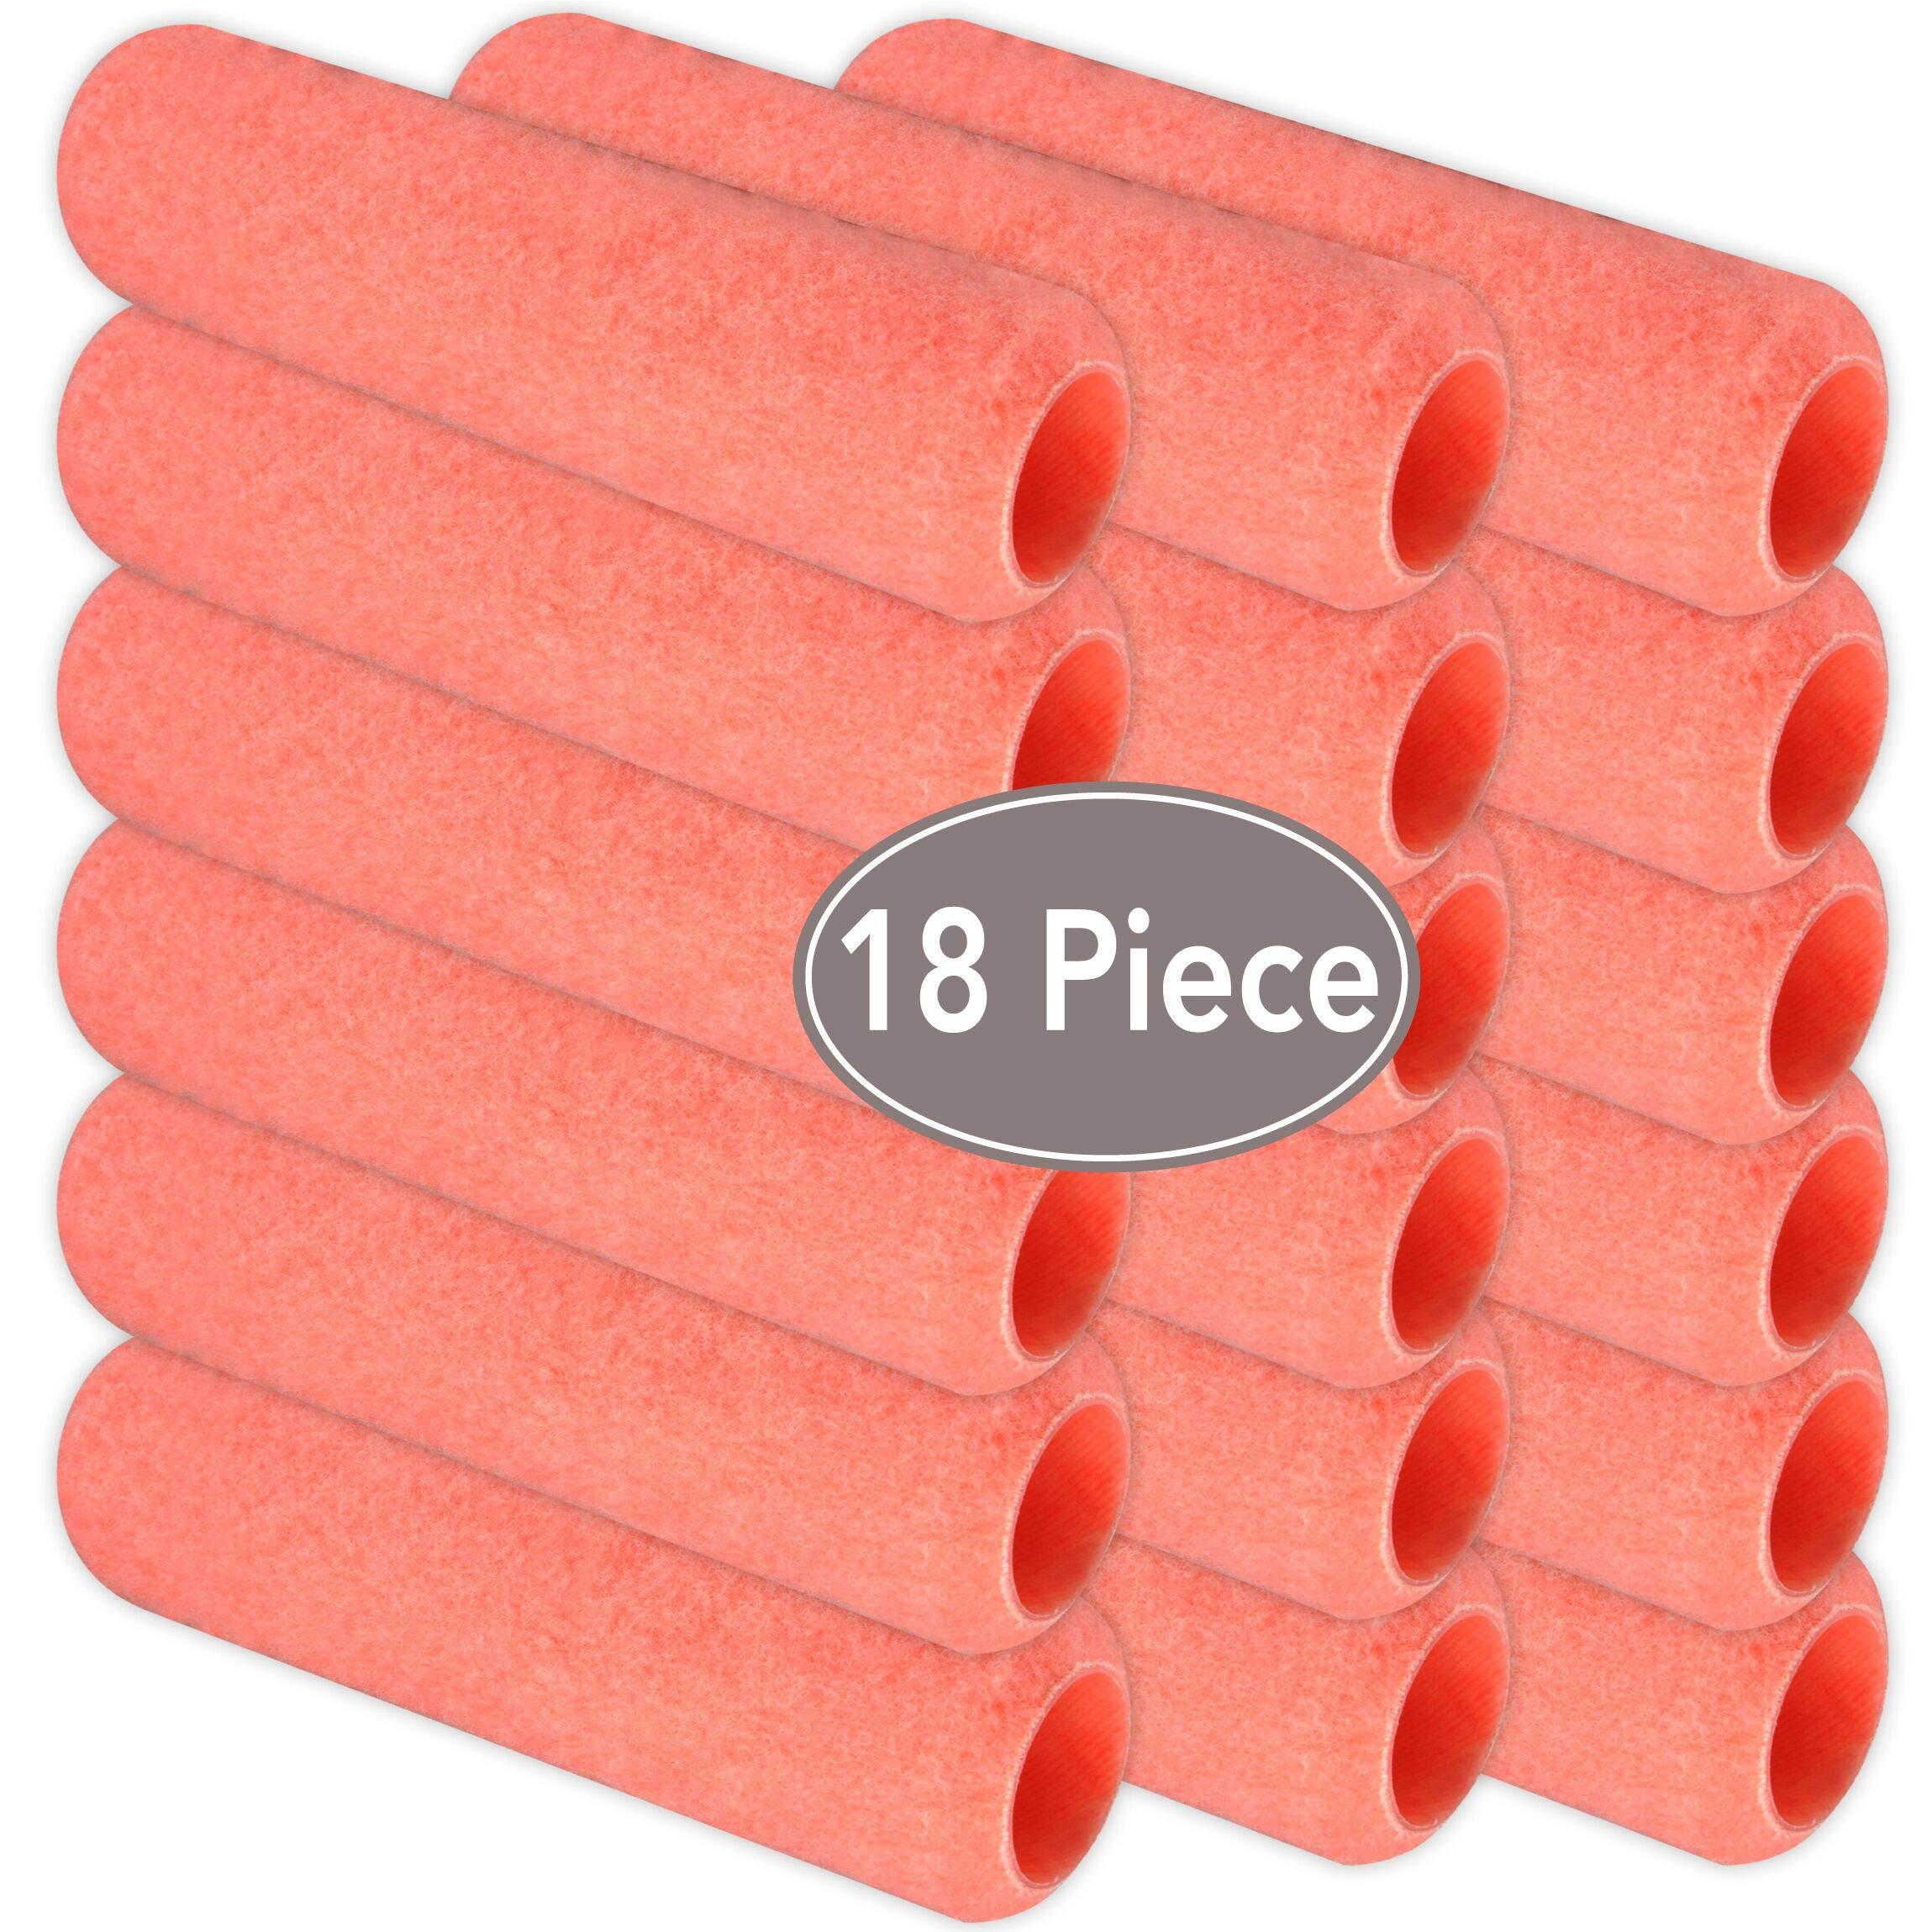 KINGORIGIN Brand 18 Piece,Paint Roller,Paint Rollers,Paint Roller Sets,Paint Roller Covers 9 inch,Paint Roller kit,Paint Tools,Home Repair Tools,Tools